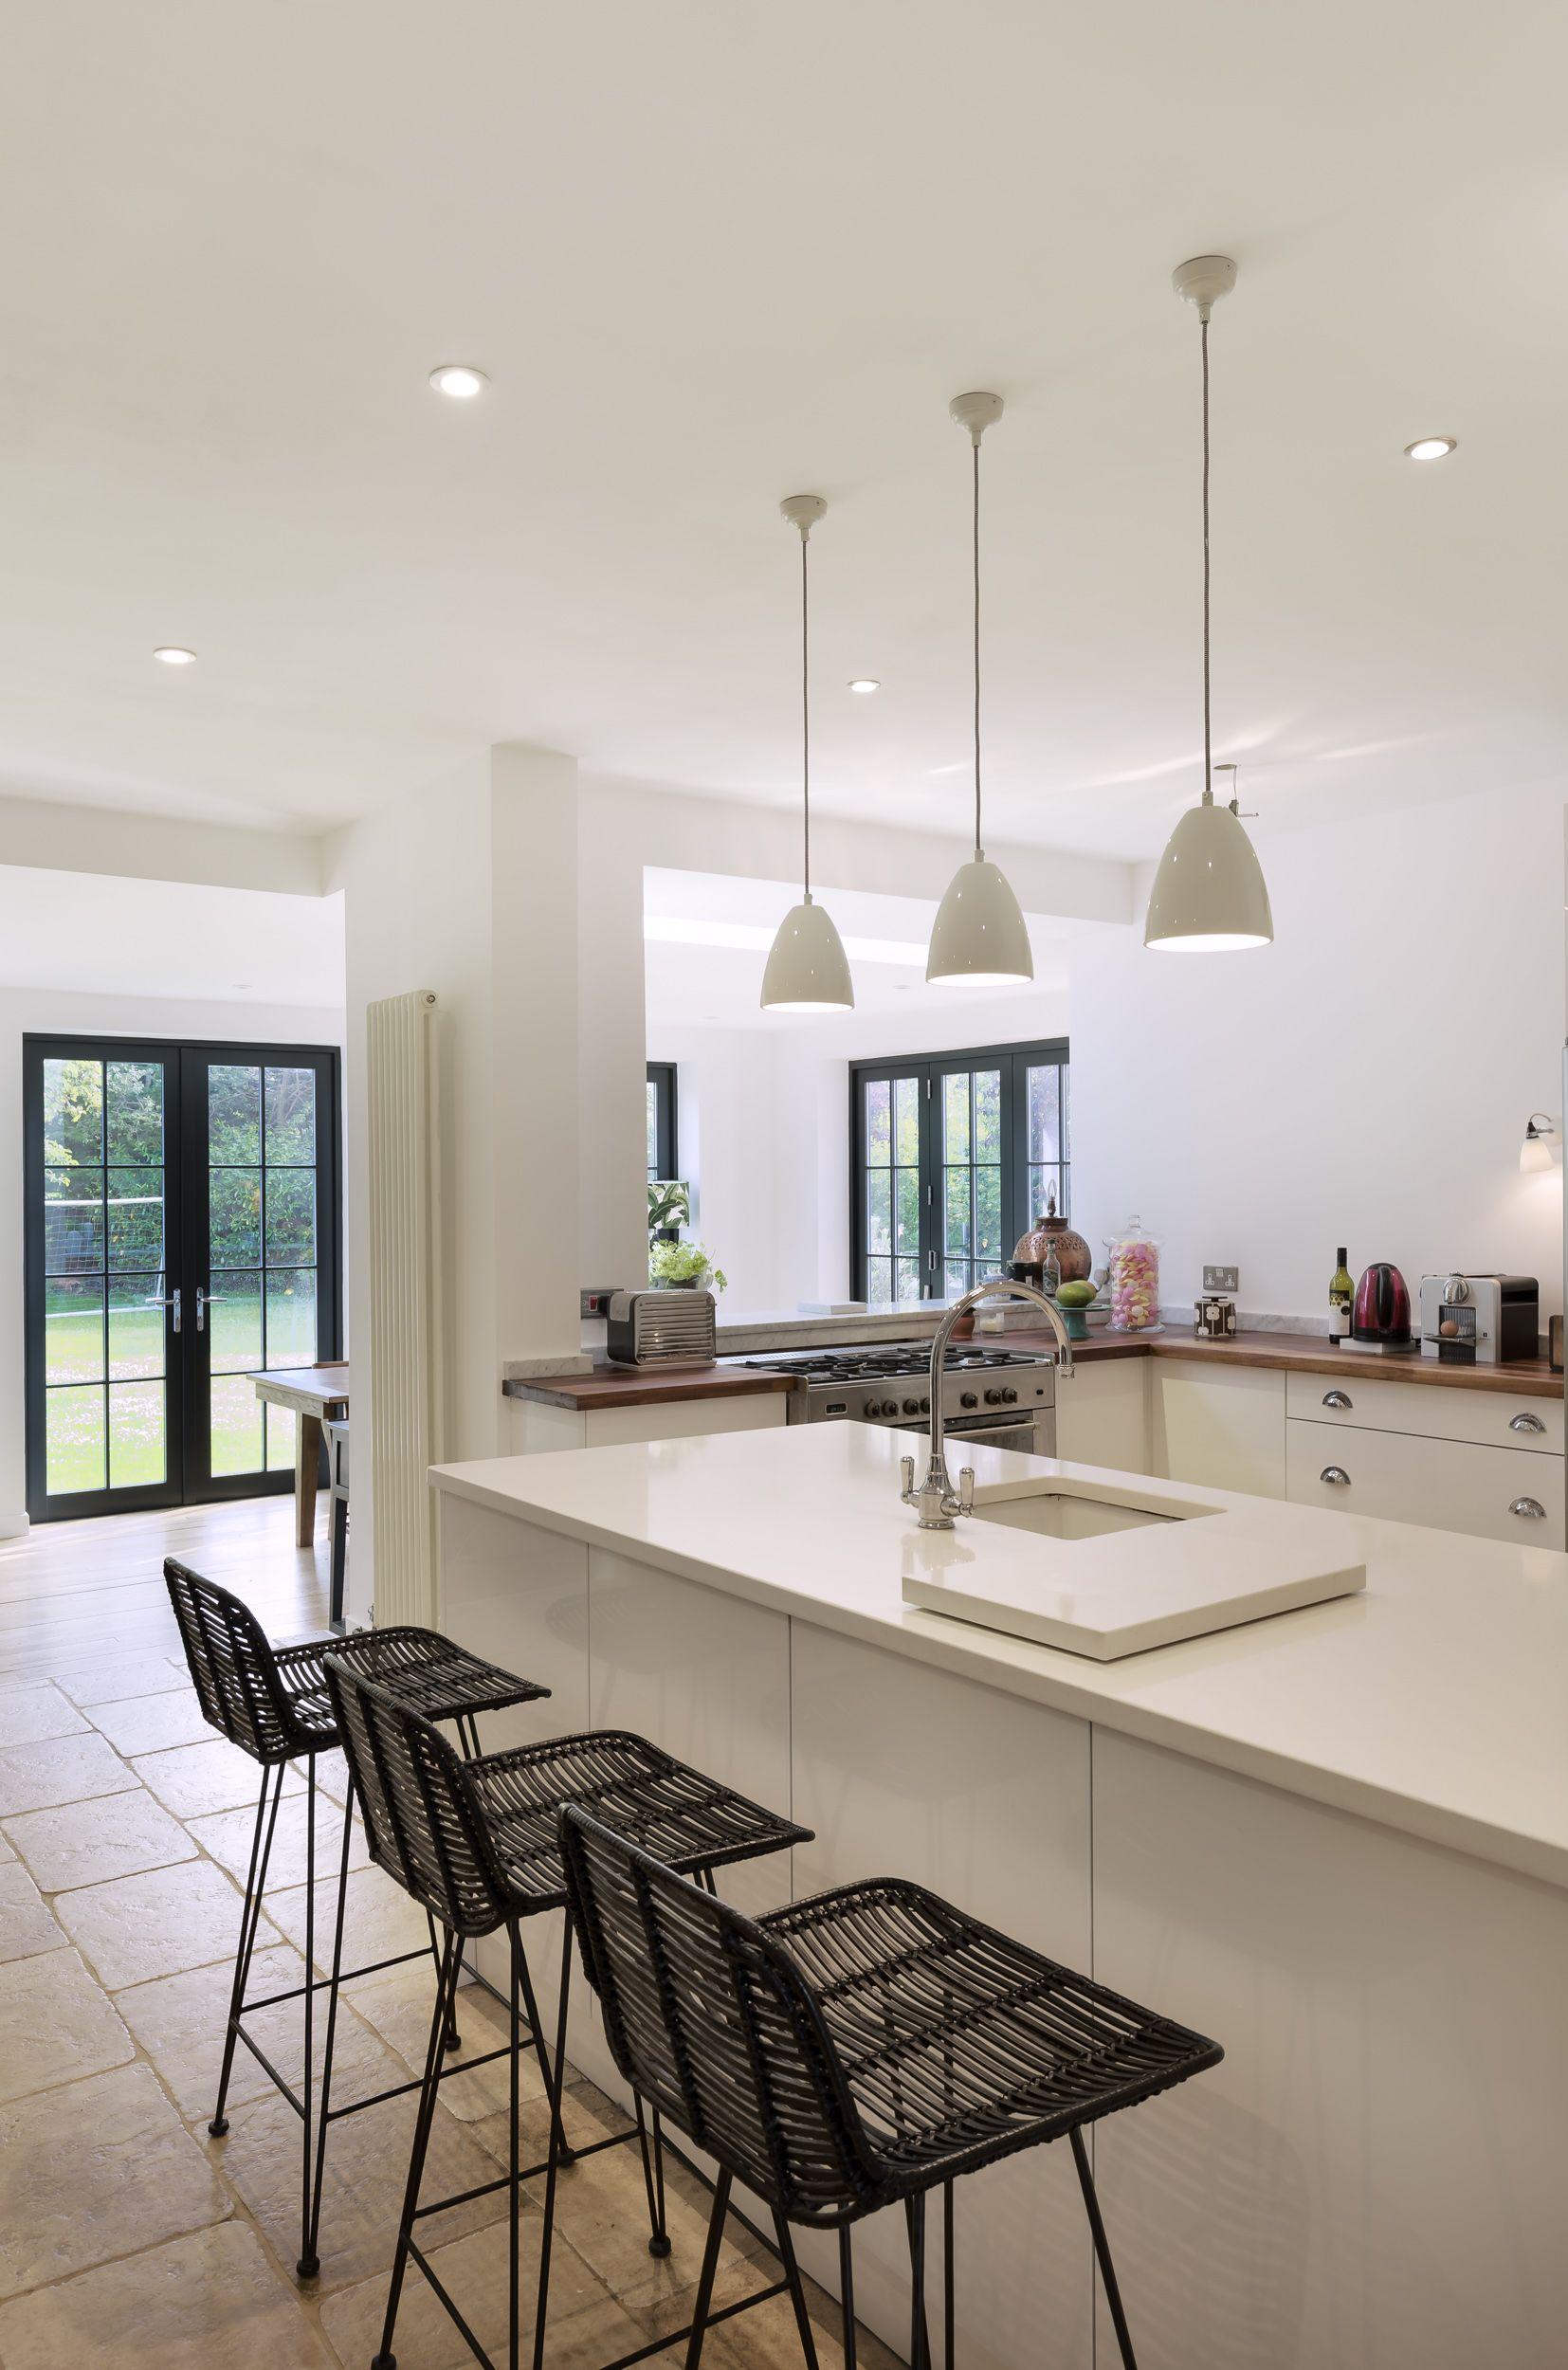 Kitchen Island Breakfast Bar Pendant Lighting. Open Plan Kitchen | Rear  Extension Breakfast Bar Island